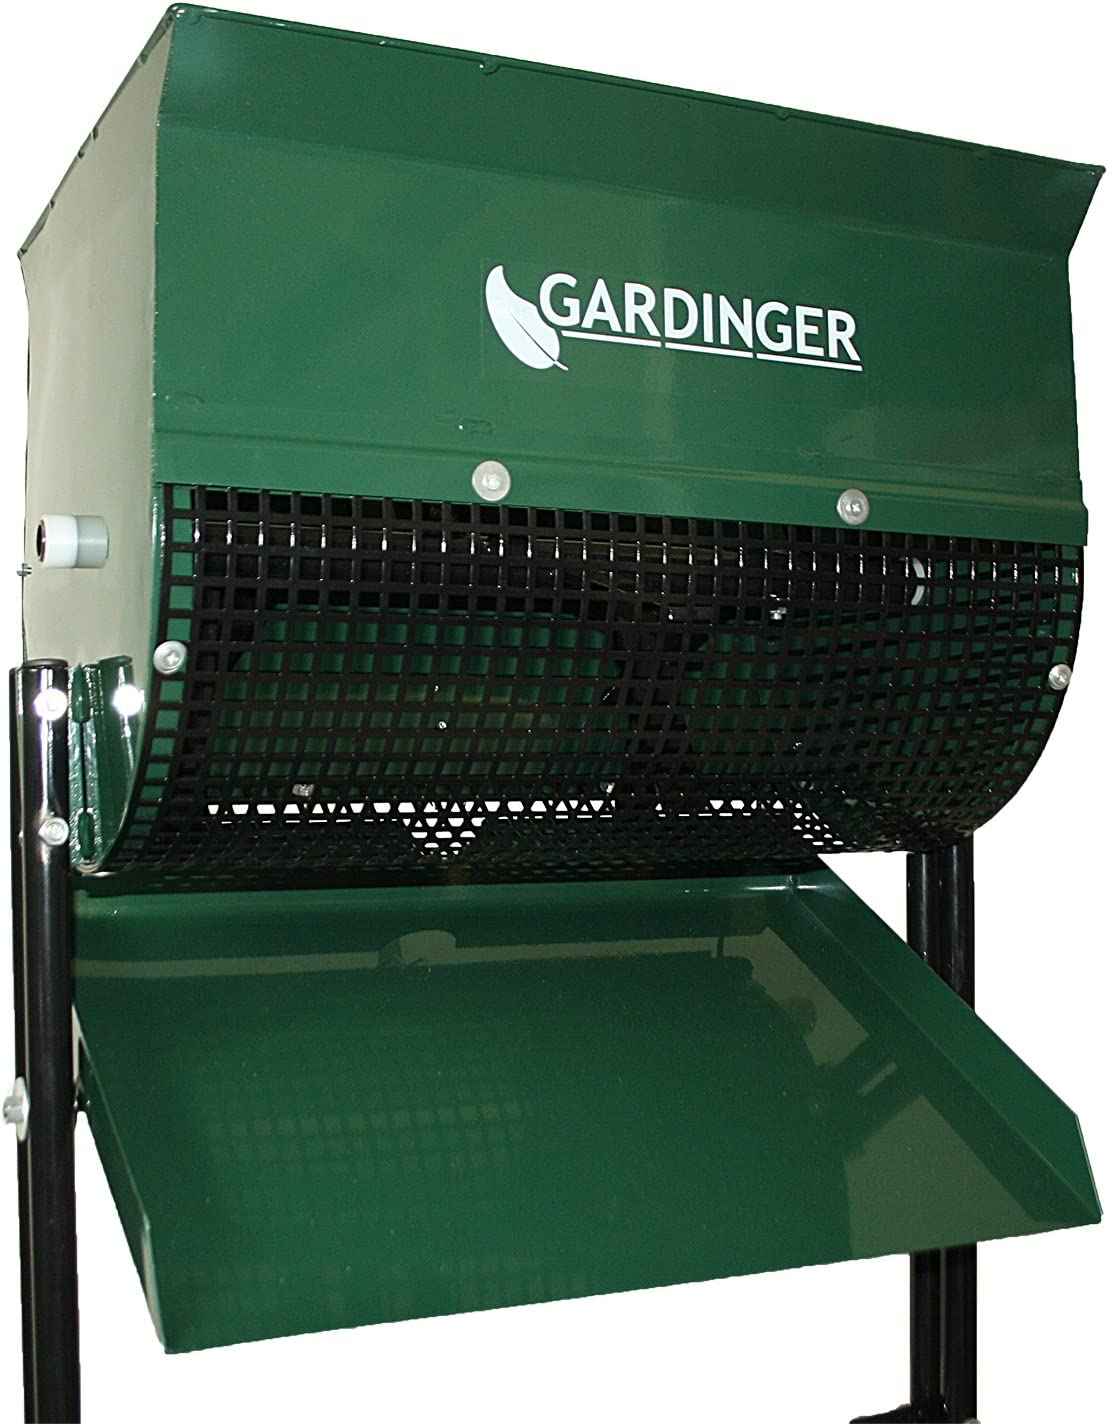 GARDINGER Feinkompostsieb Stahlblech lackiert mit Drehspindel (Kompostsieb Sieb) Feinkompostierer